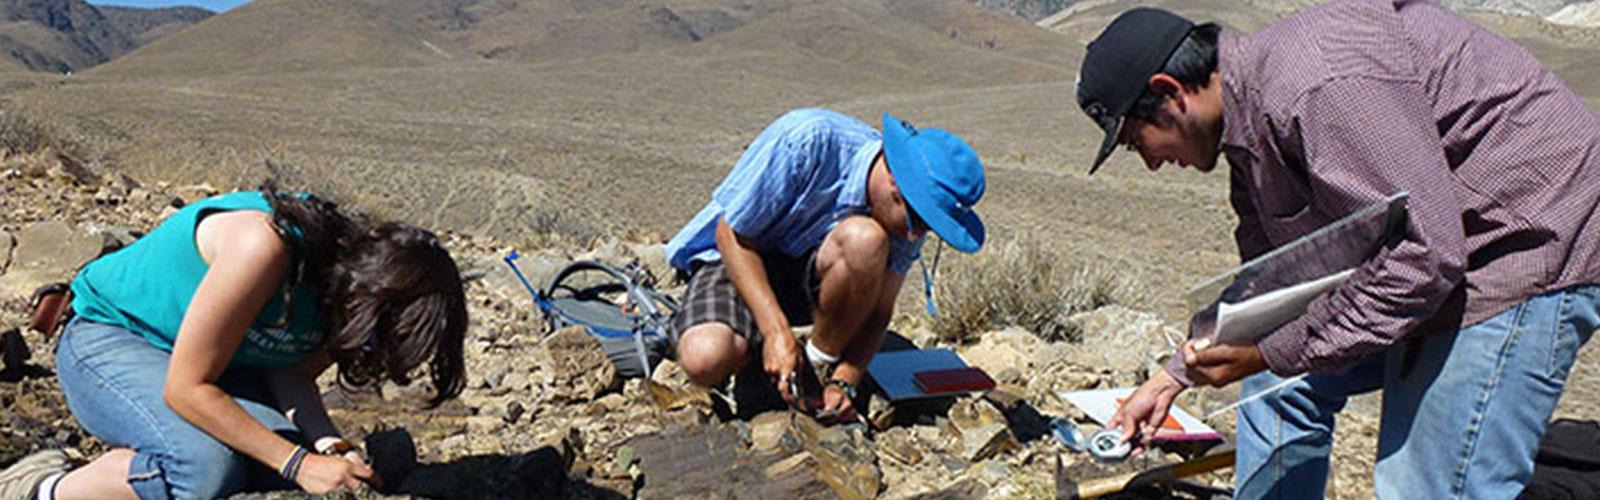 3 people examining rocks on desert floor